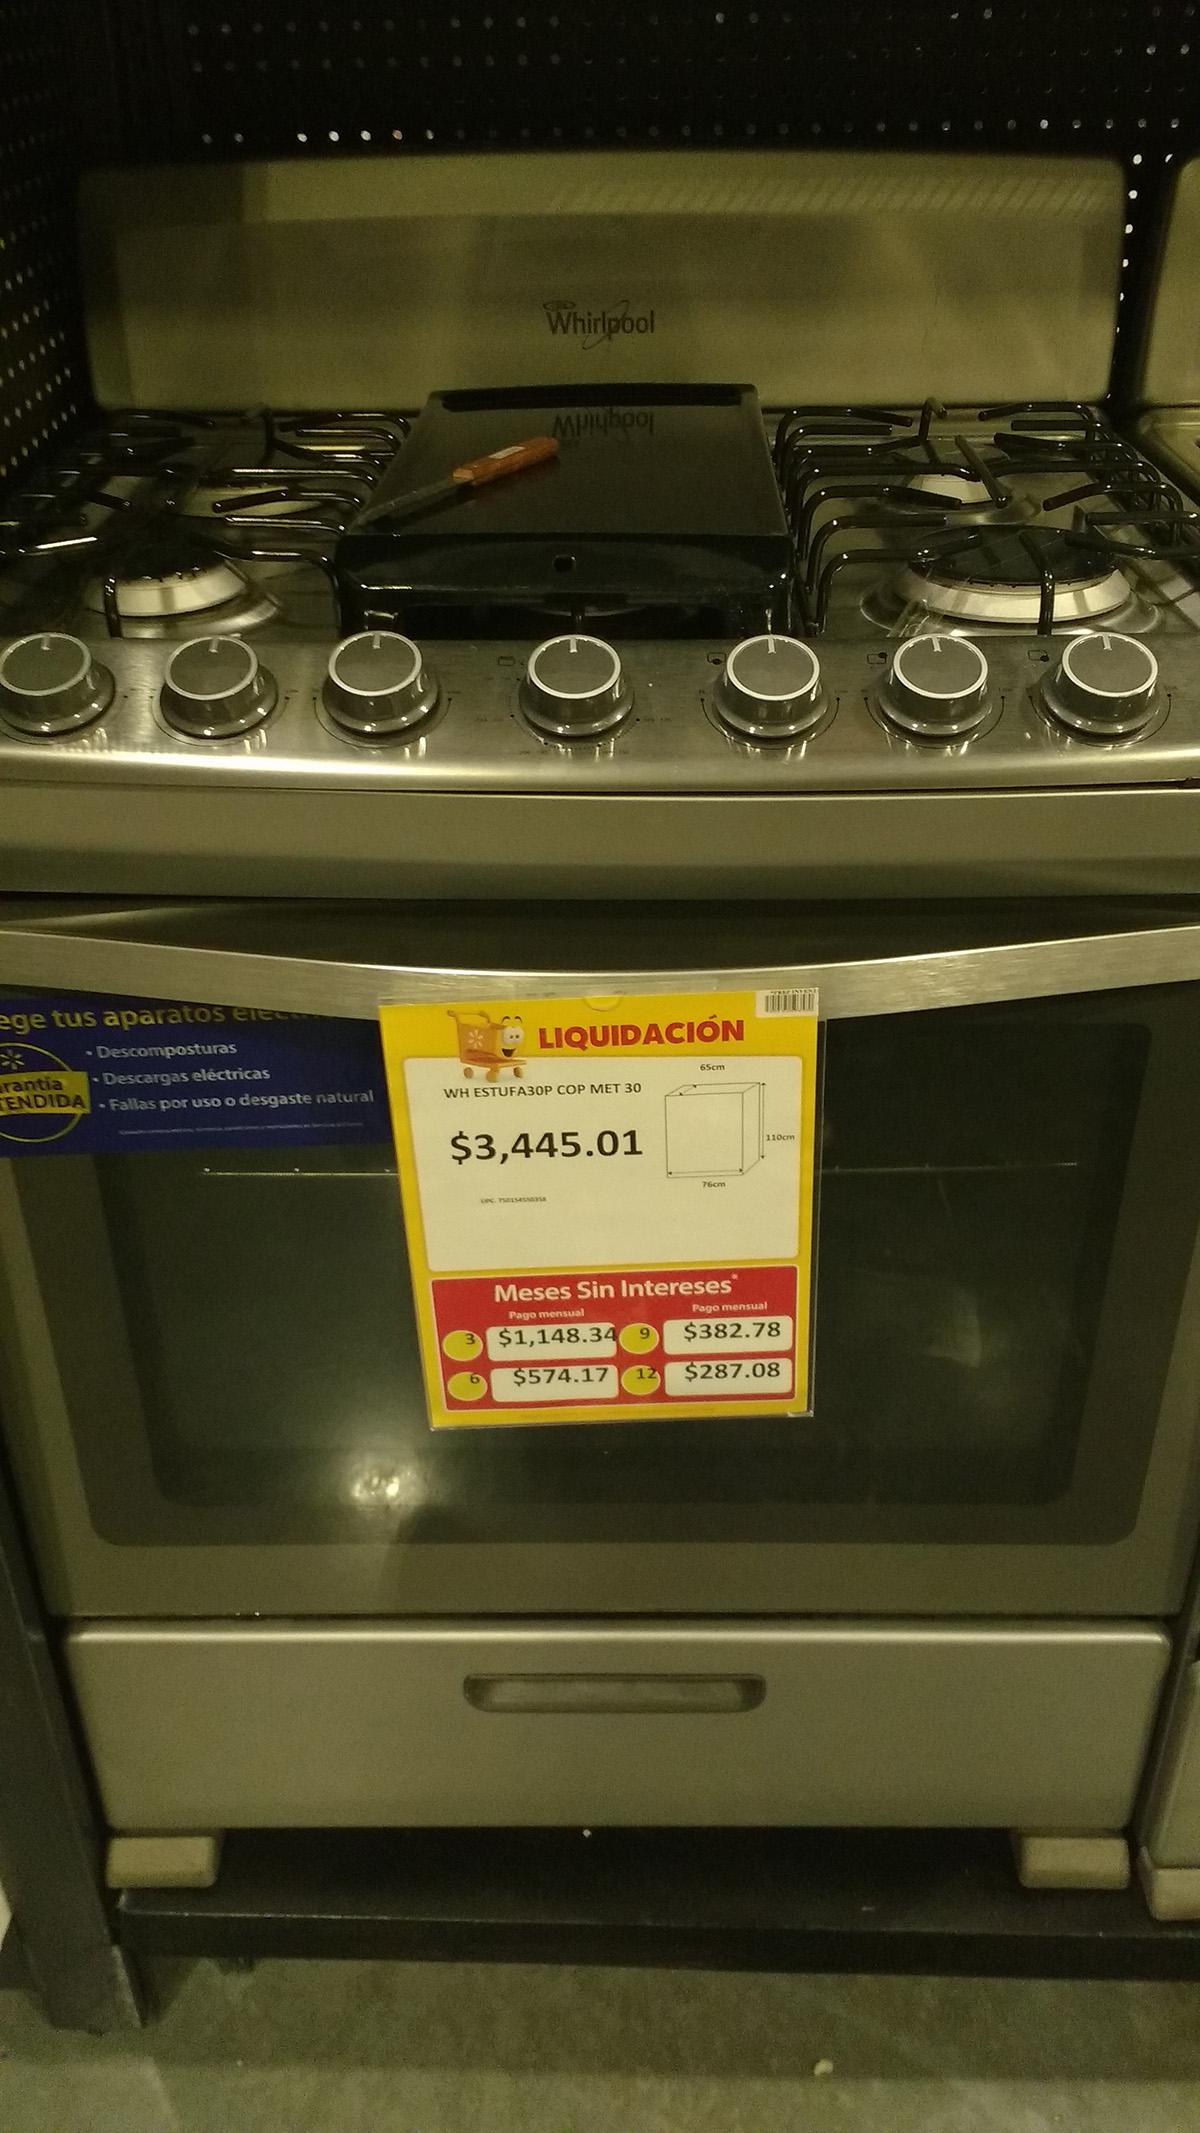 "Walmart Cuemanco: estufa Whirlpool 30"" de acero inoxidable a $3,455.01"